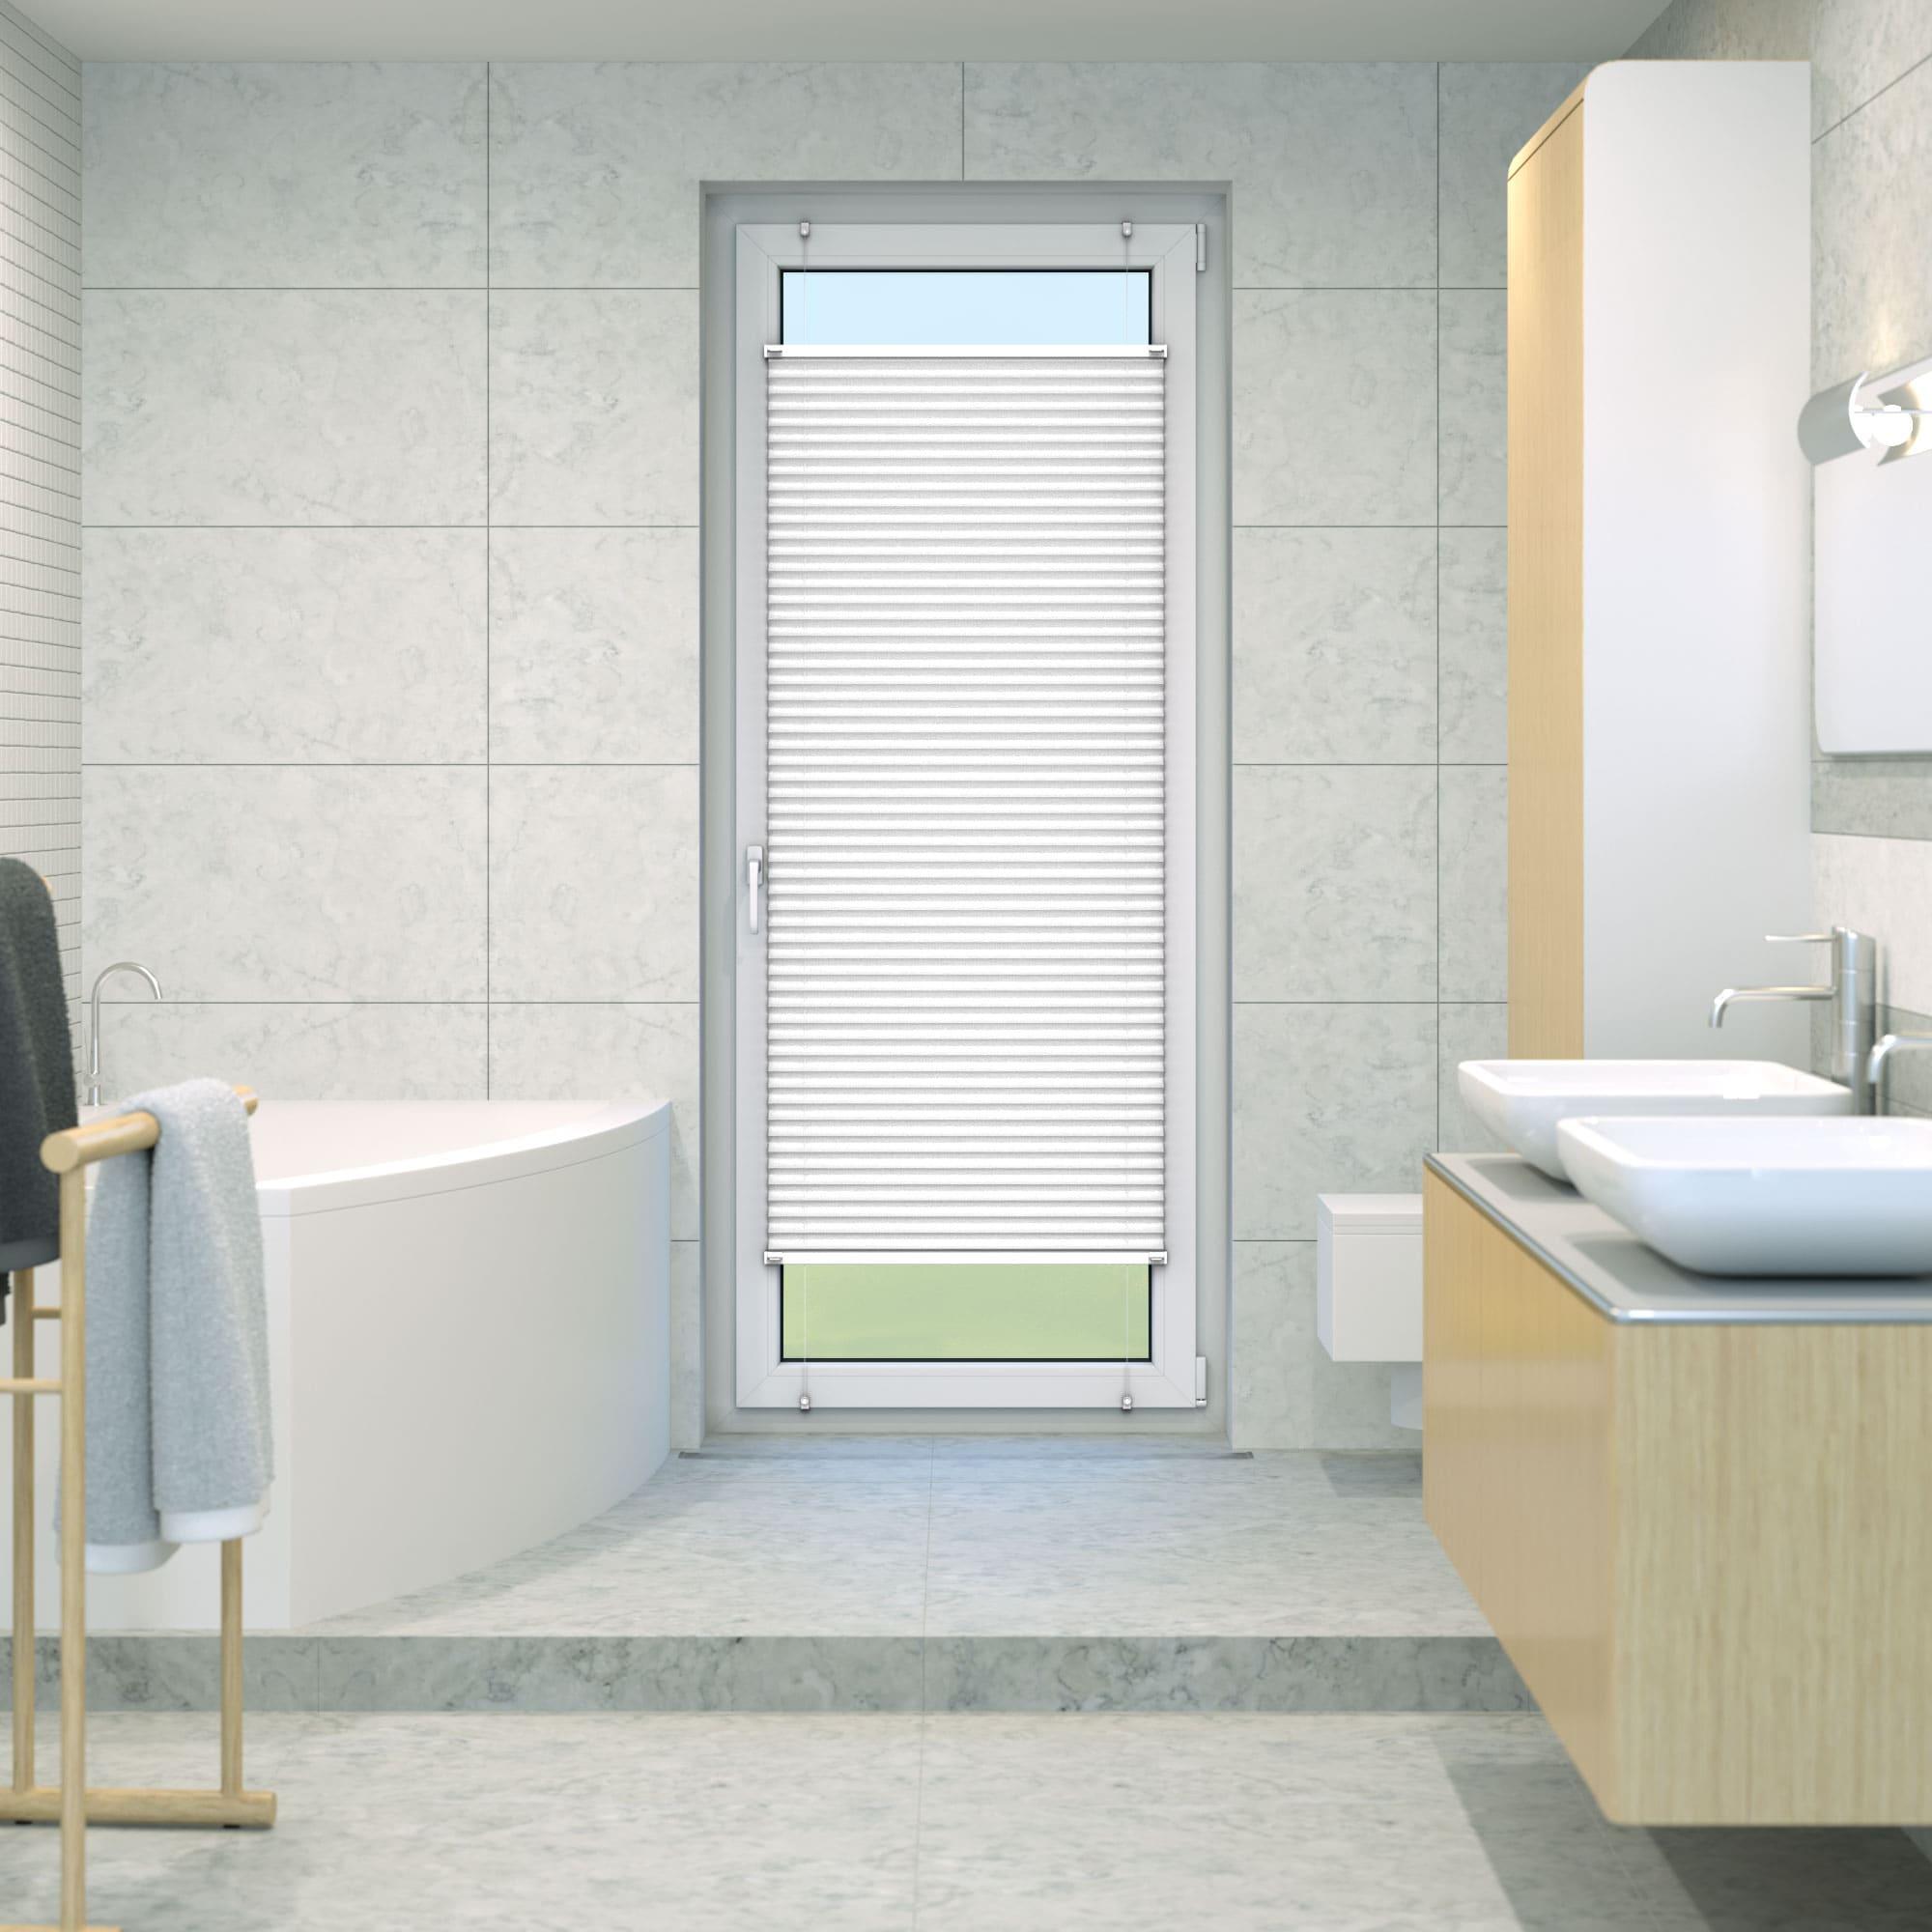 Klemmfix-Plissee-Faltrollo-ohne-Bohren-Fenster-Tuer-Plisseerollo-Plisee-Easyfix Indexbild 23